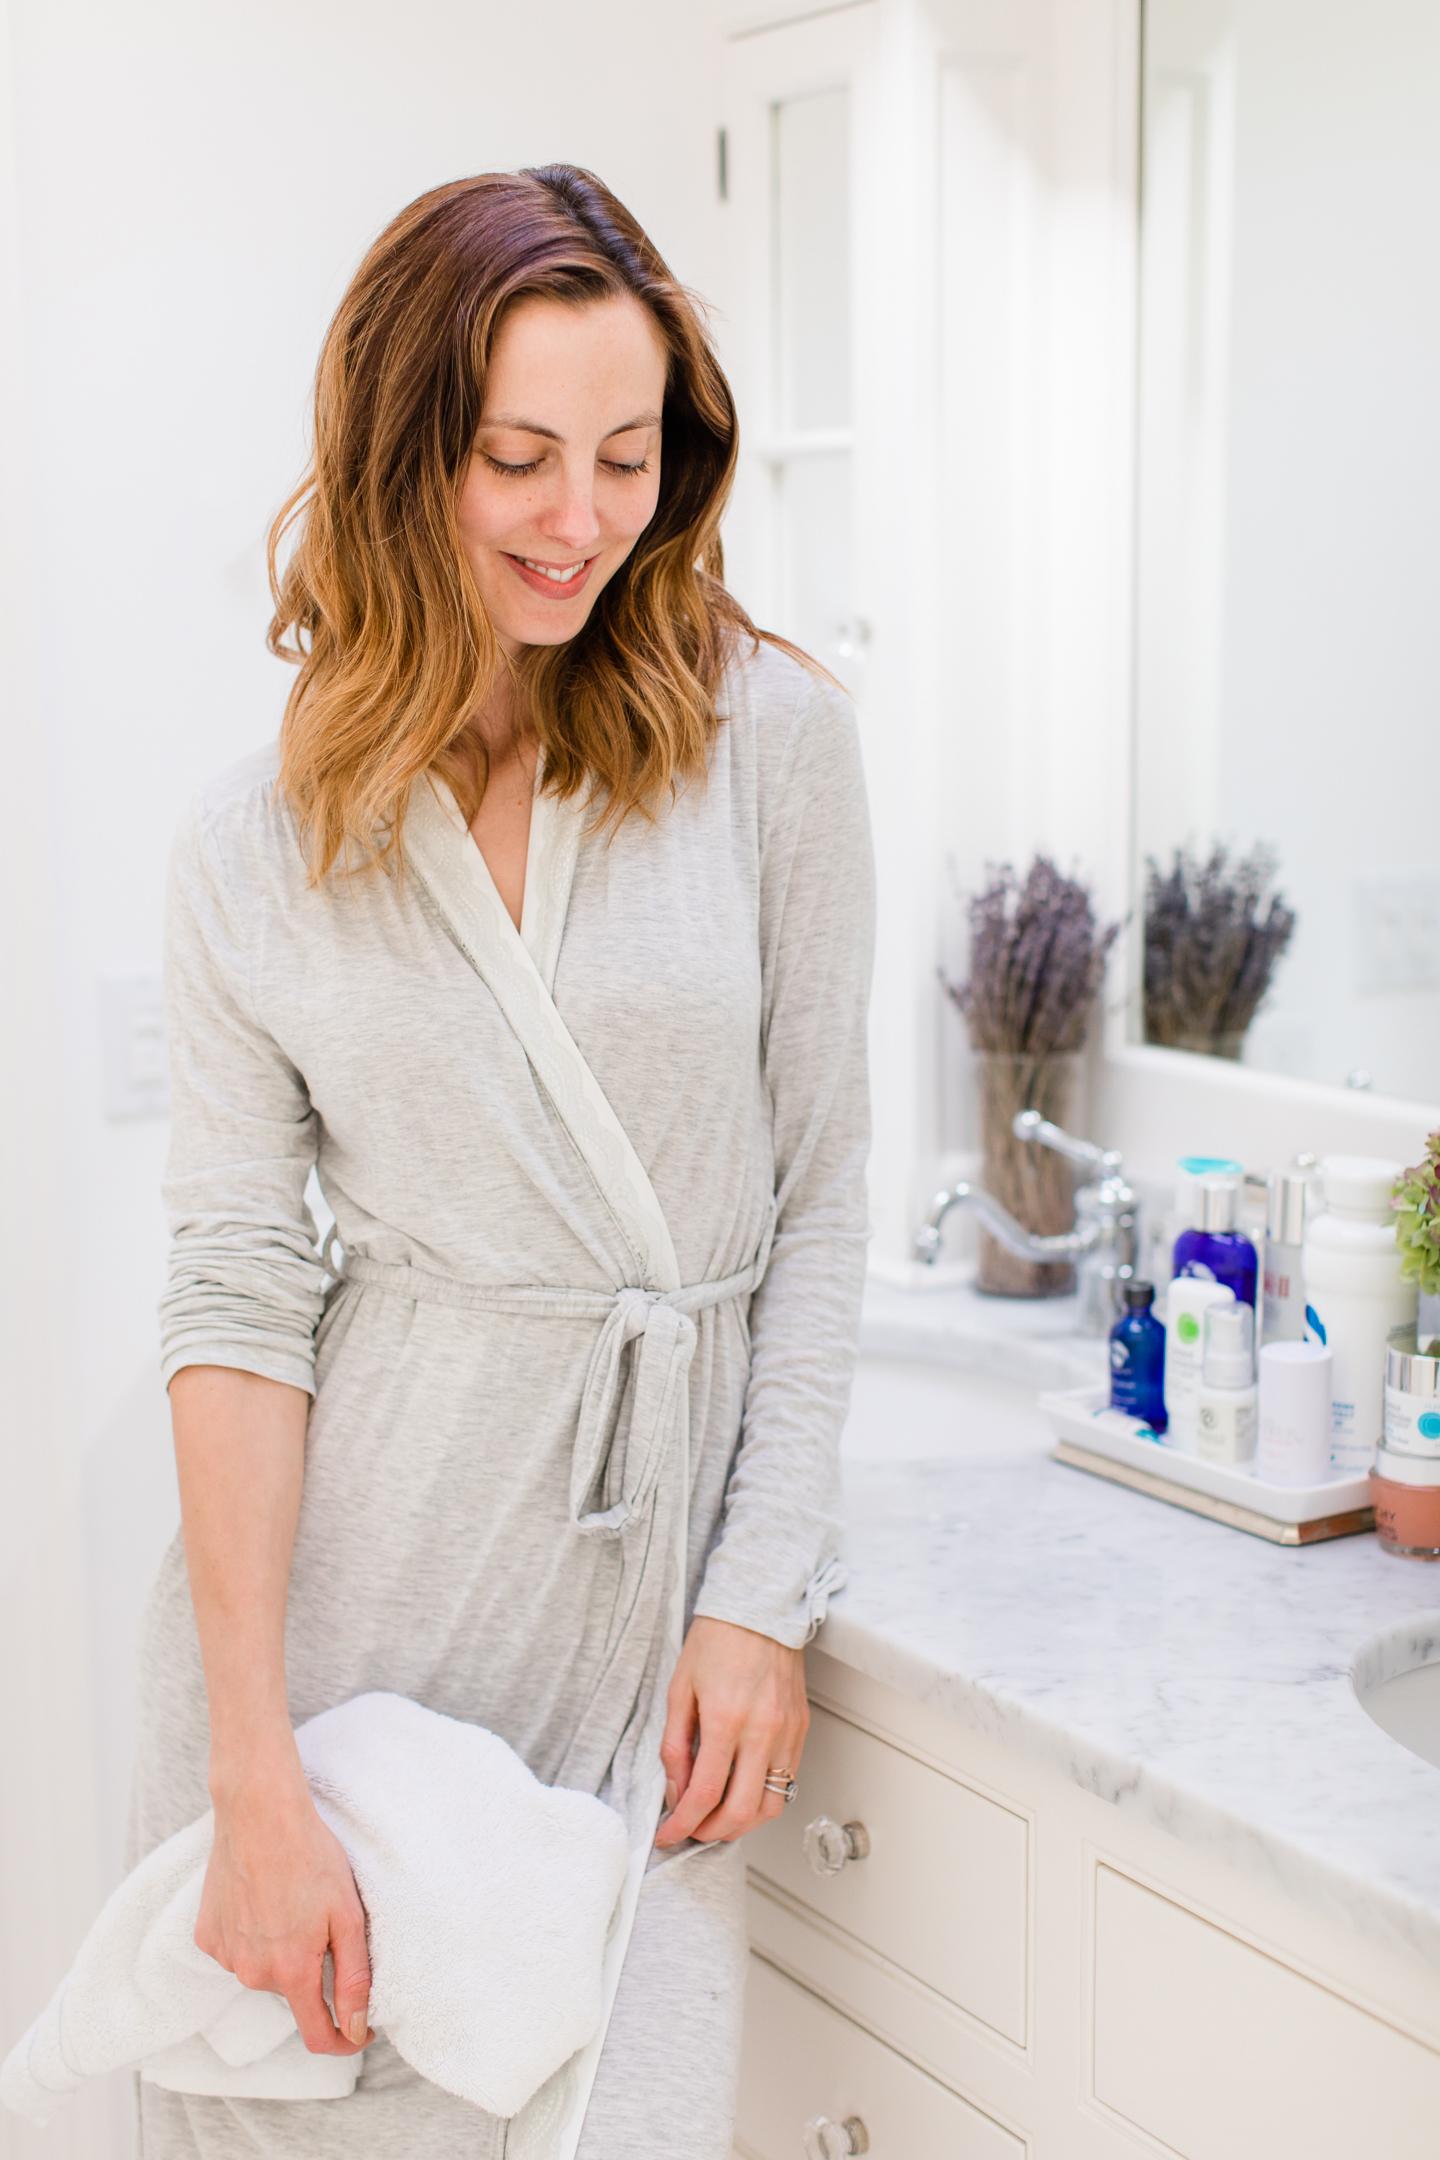 Eva Amurri Martino shares her skincare routine